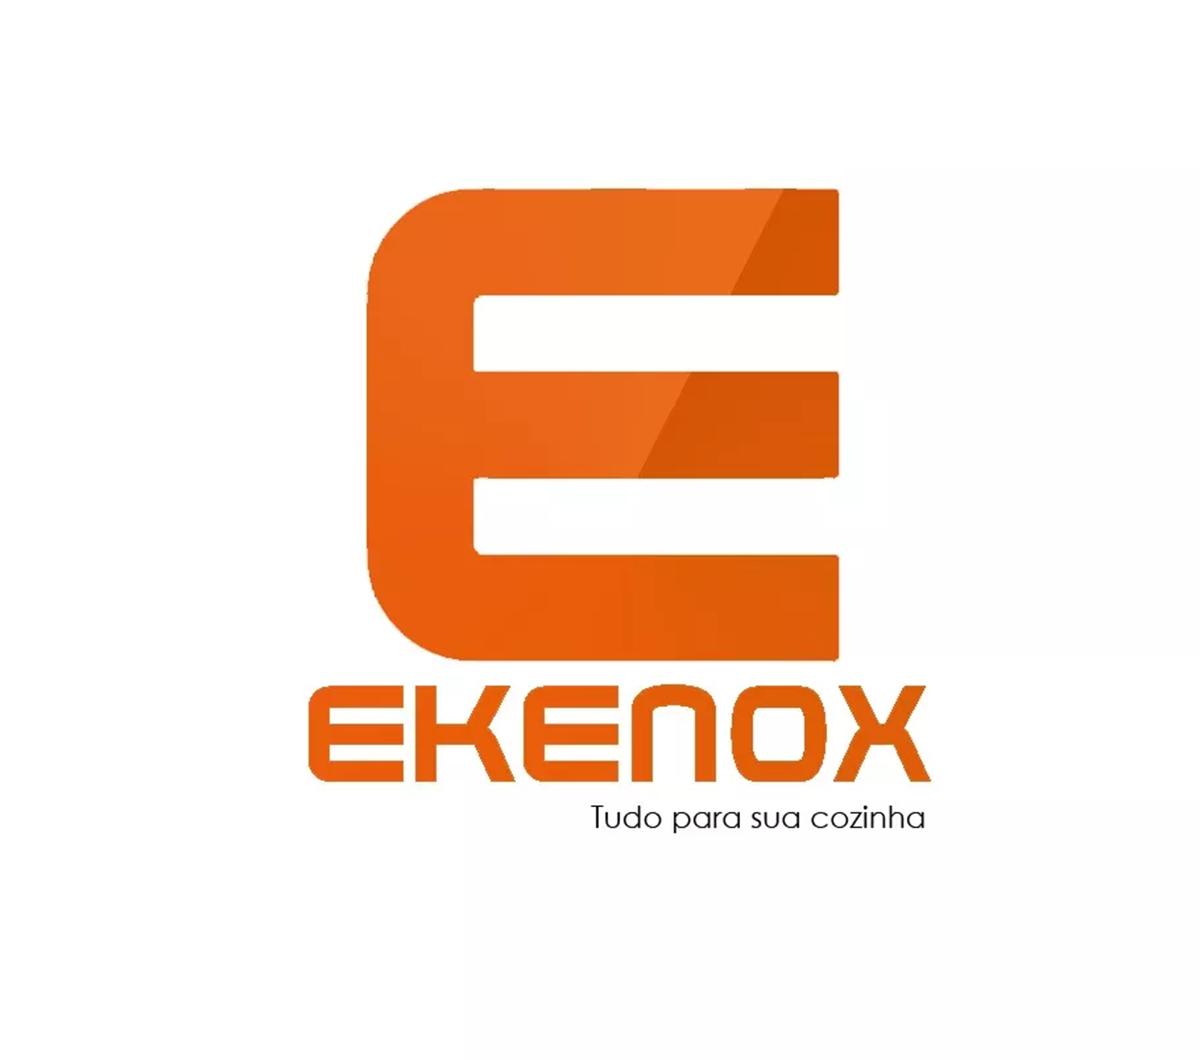 Mesa Inox 1,40 x 0,70 PG EKENOX K